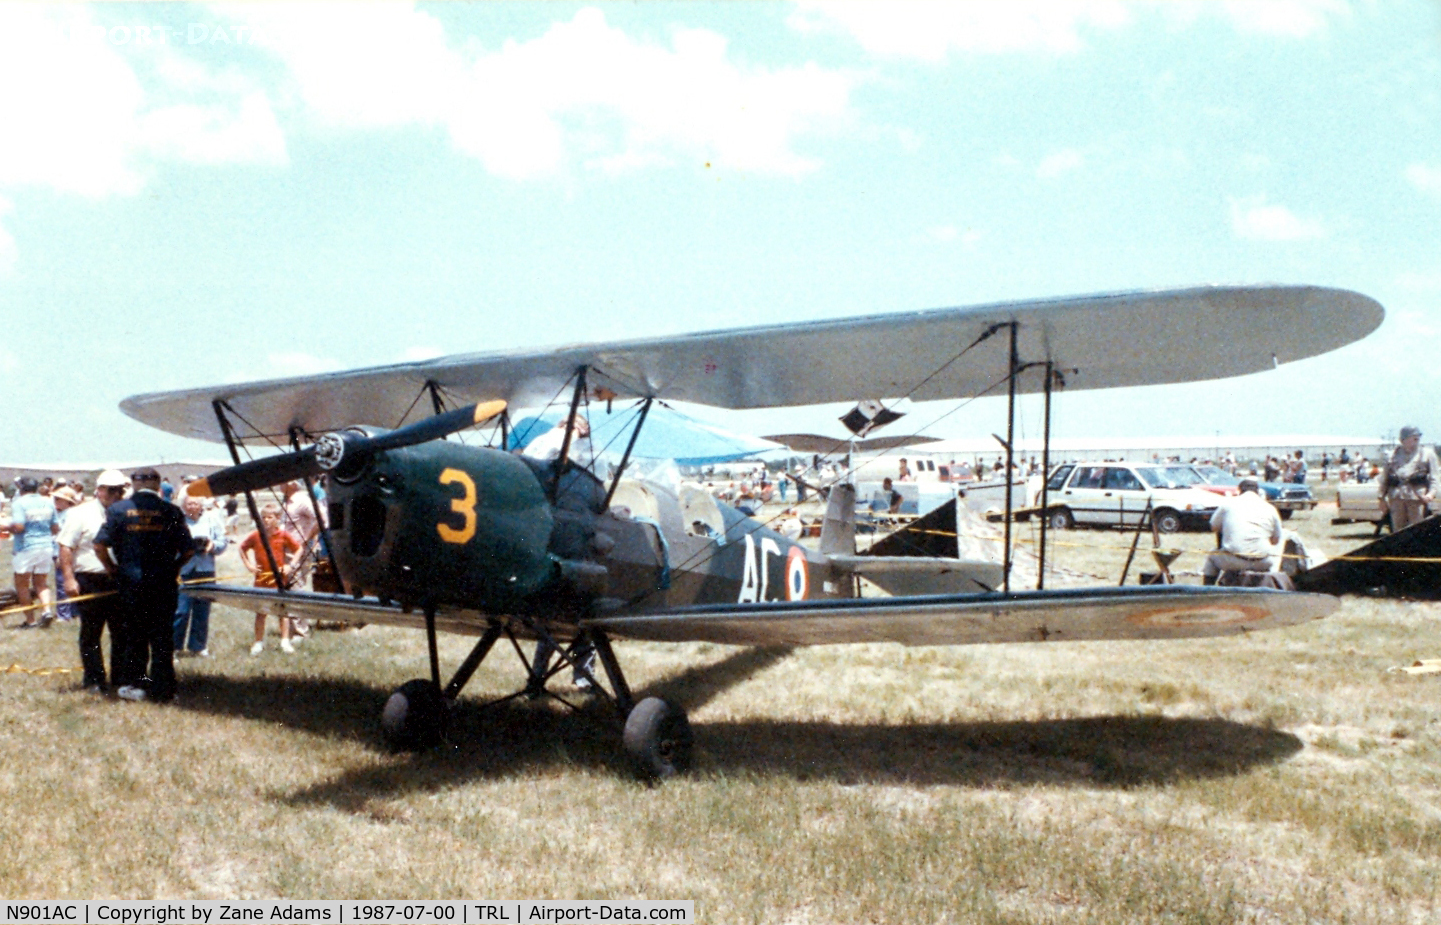 N901AC, 1948 Stampe-Vertongen SV-4C C/N 1060, Stamp SV-4C at Terrell Airshow